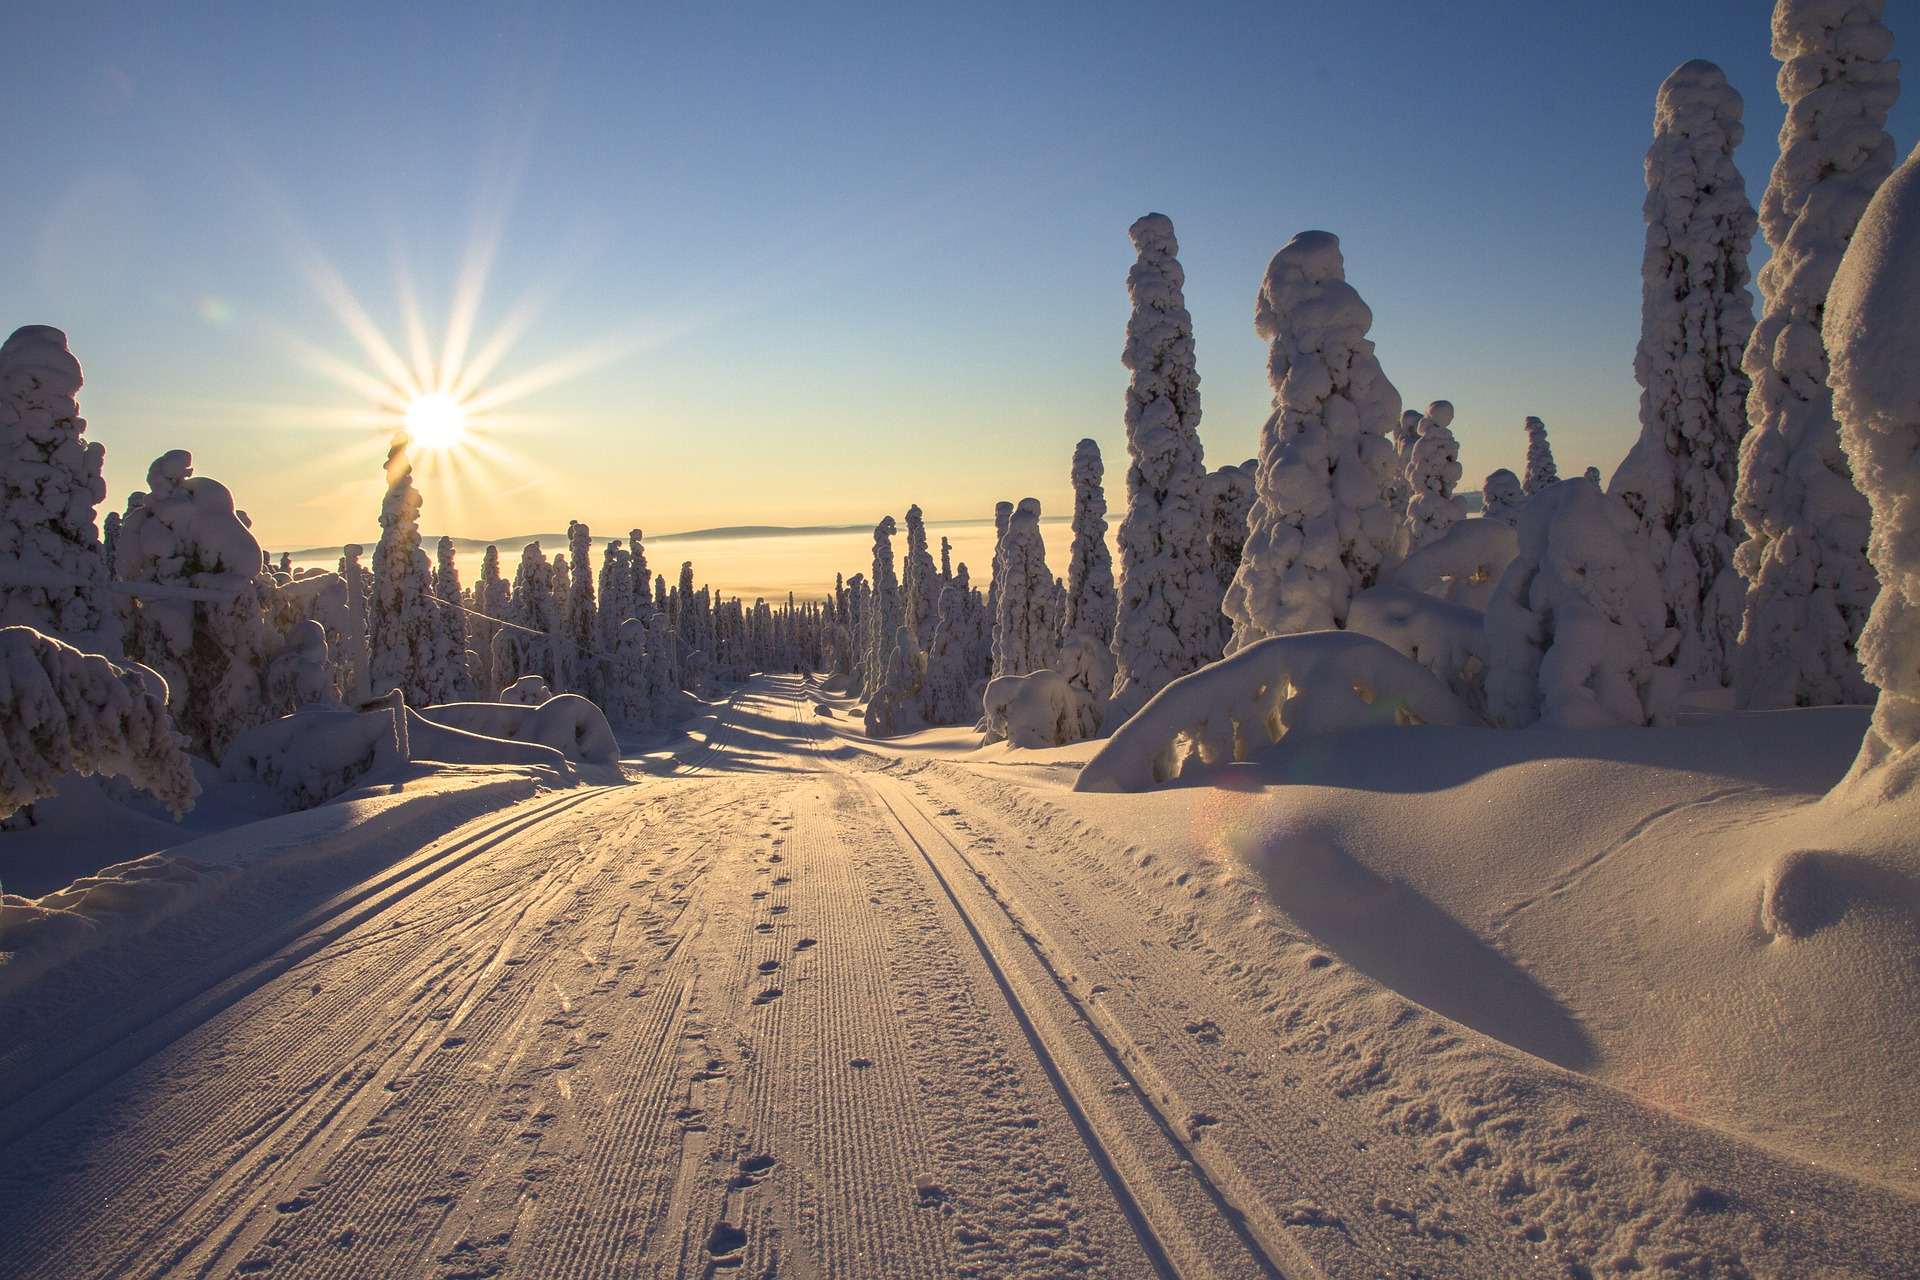 finland-2215318_1920.jpg